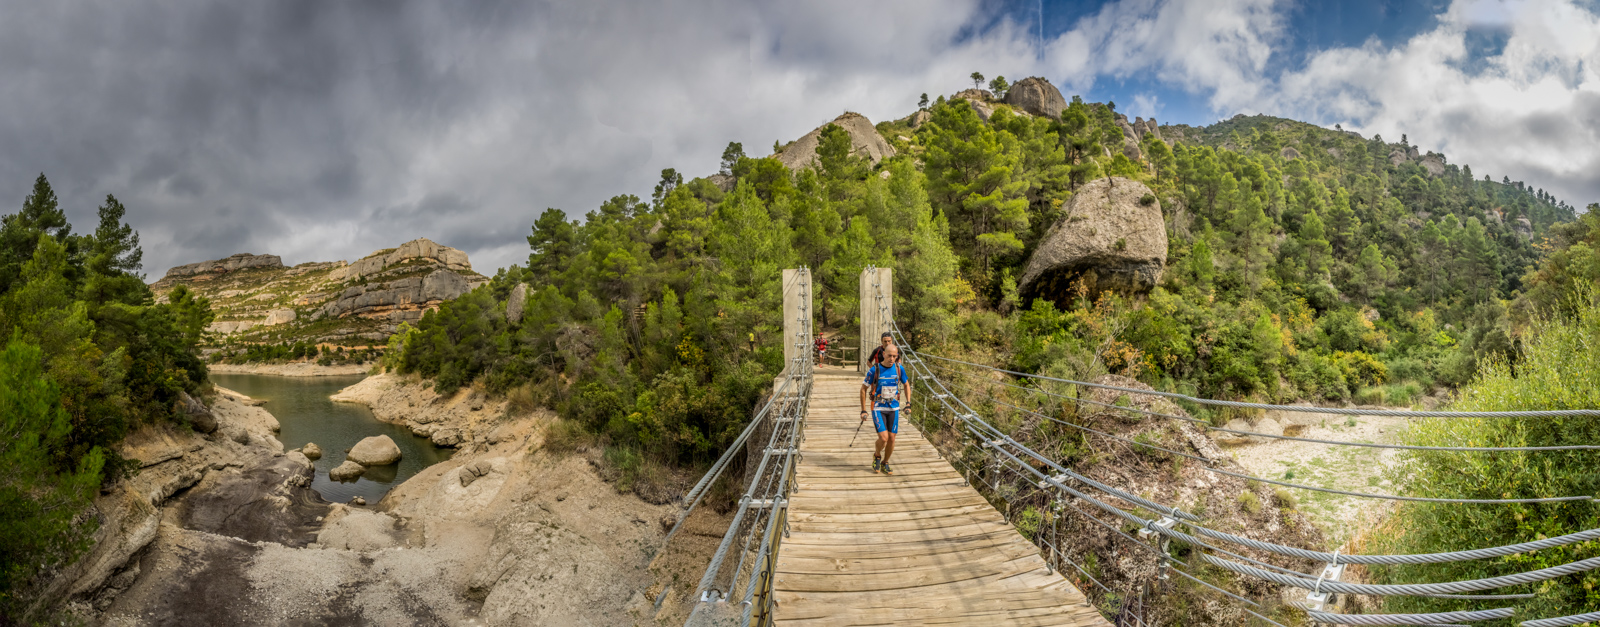 UTSM - Ultra Trail Serra de Montsant (Serra de Montsant-Priorat)